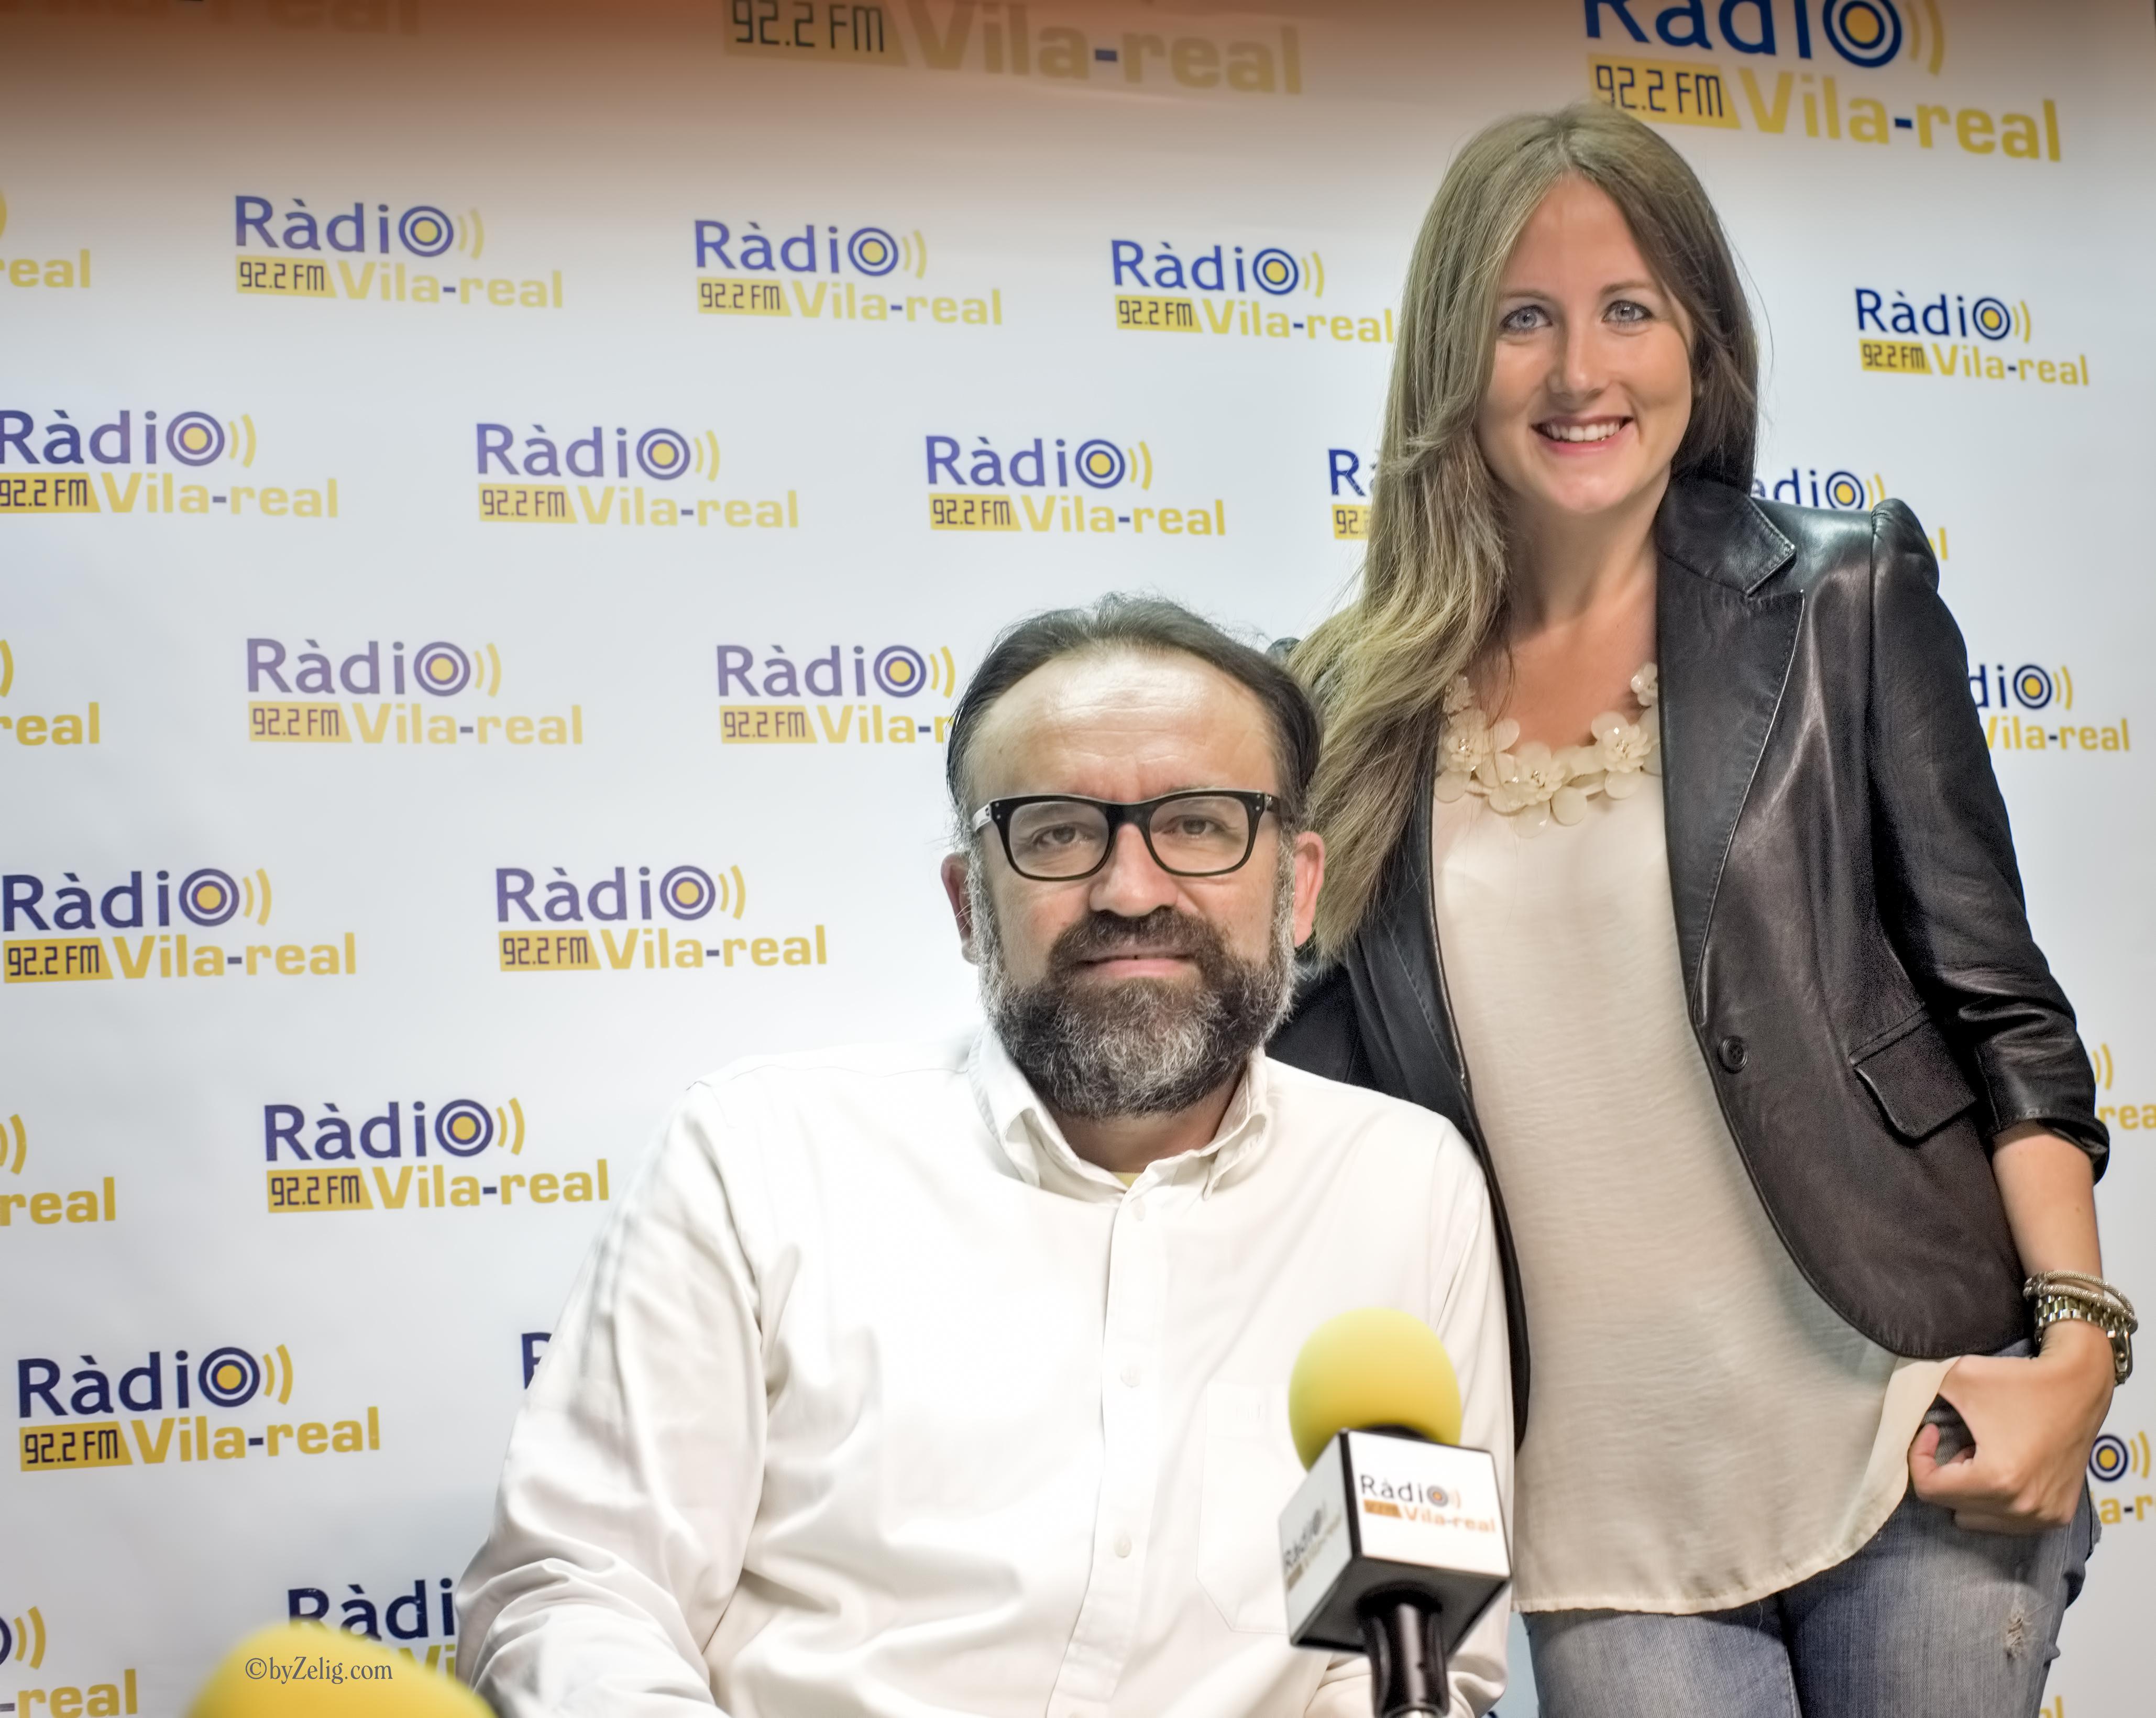 Esports Radio Vila-real. Programa del 14 de febrero de 2017